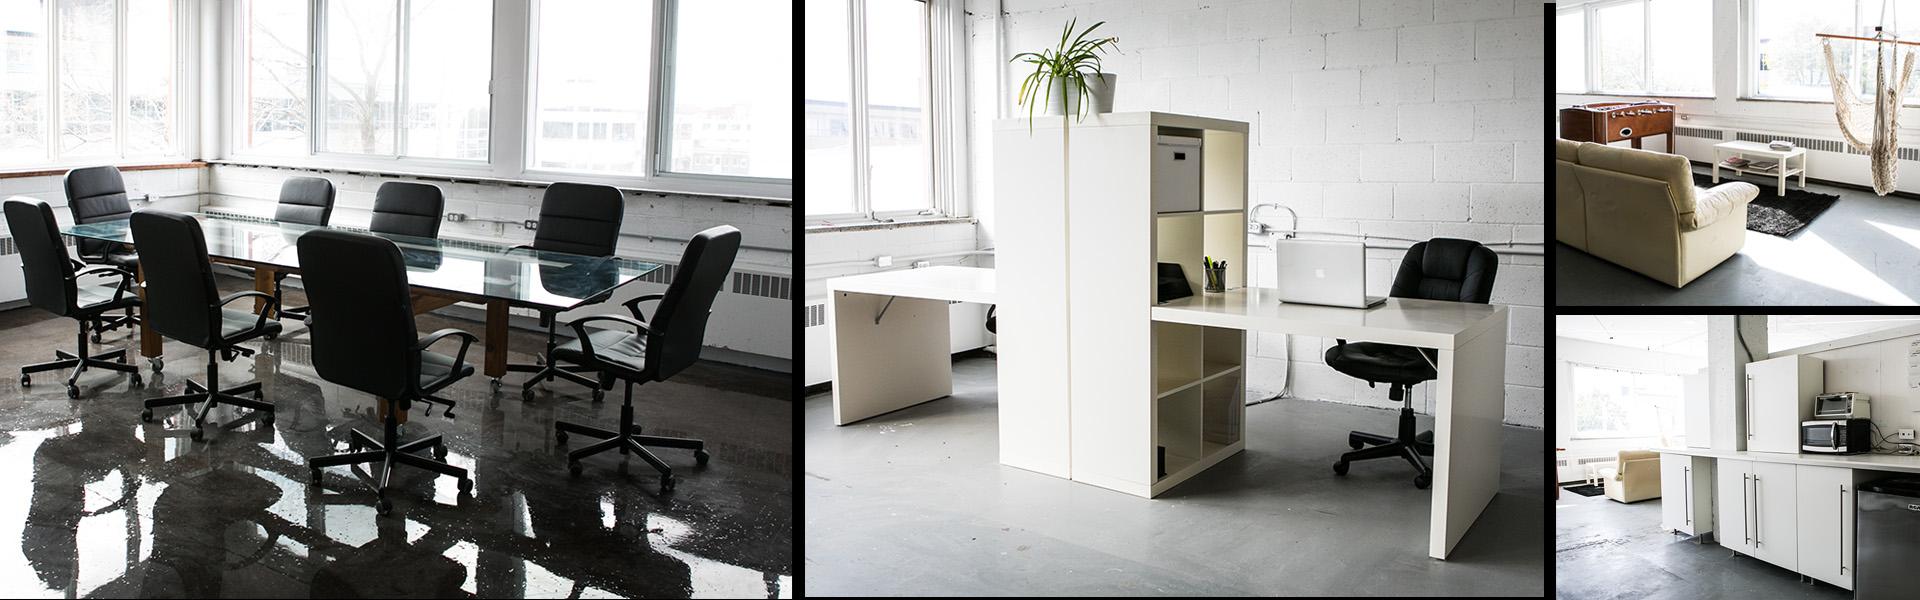 blog le 402 espace cr atif coworking montr al. Black Bedroom Furniture Sets. Home Design Ideas